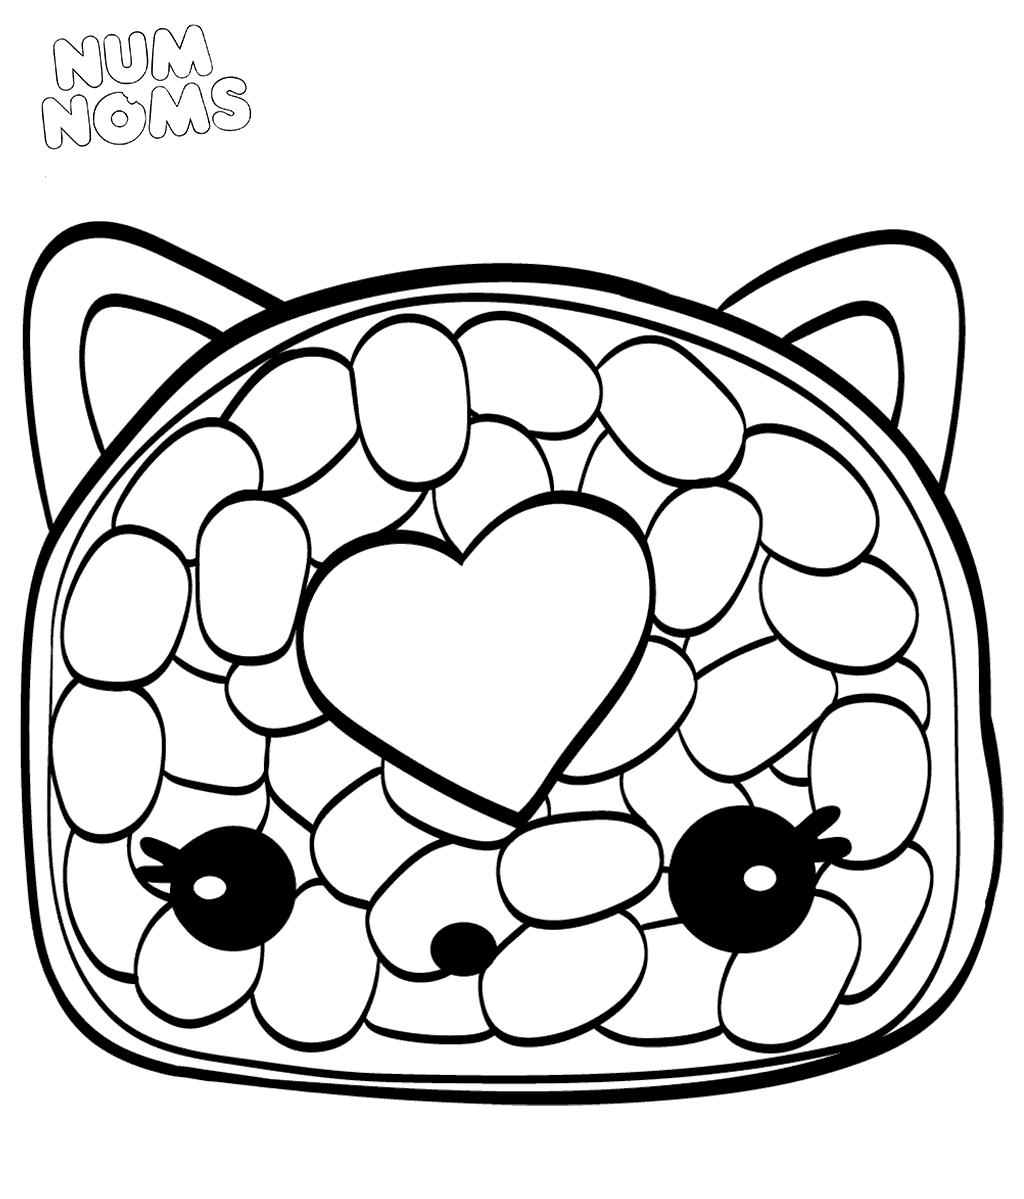 Num Noms Coloring Pages Cali Roll Cute Coloring Pages Coloring Pages Cartoon Coloring Pages